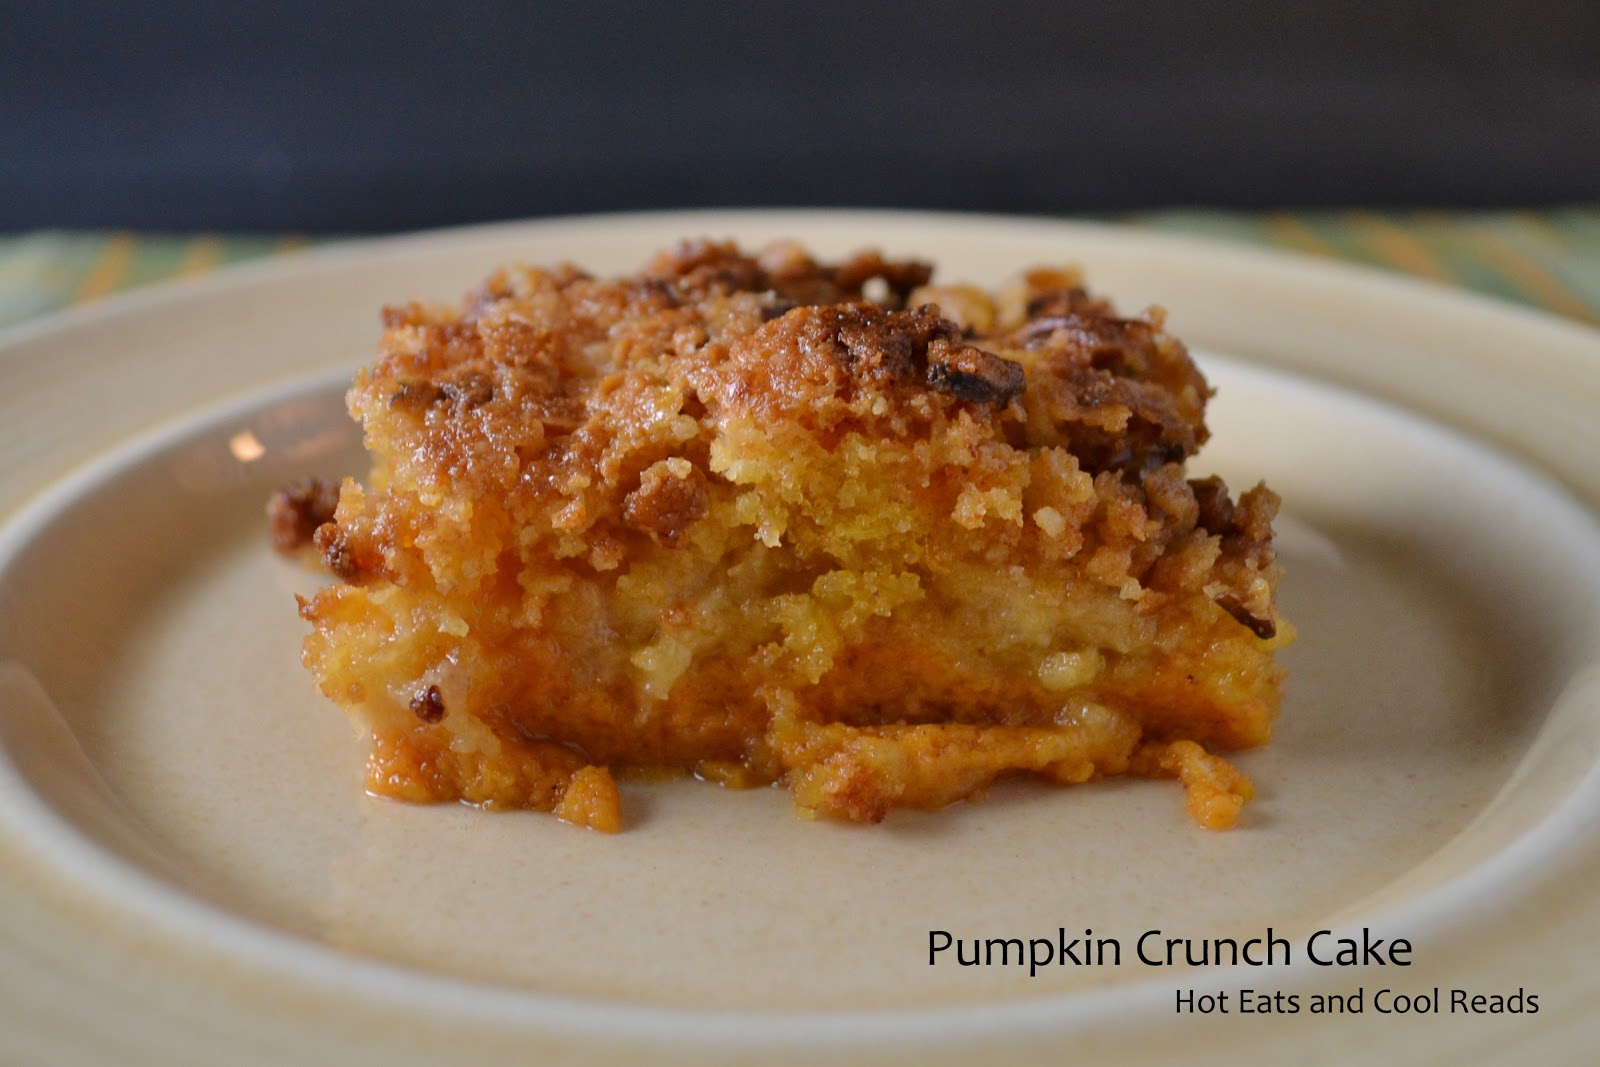 Hot Eats and Cool Reads: Pumpkin Crunch Cake Recipe